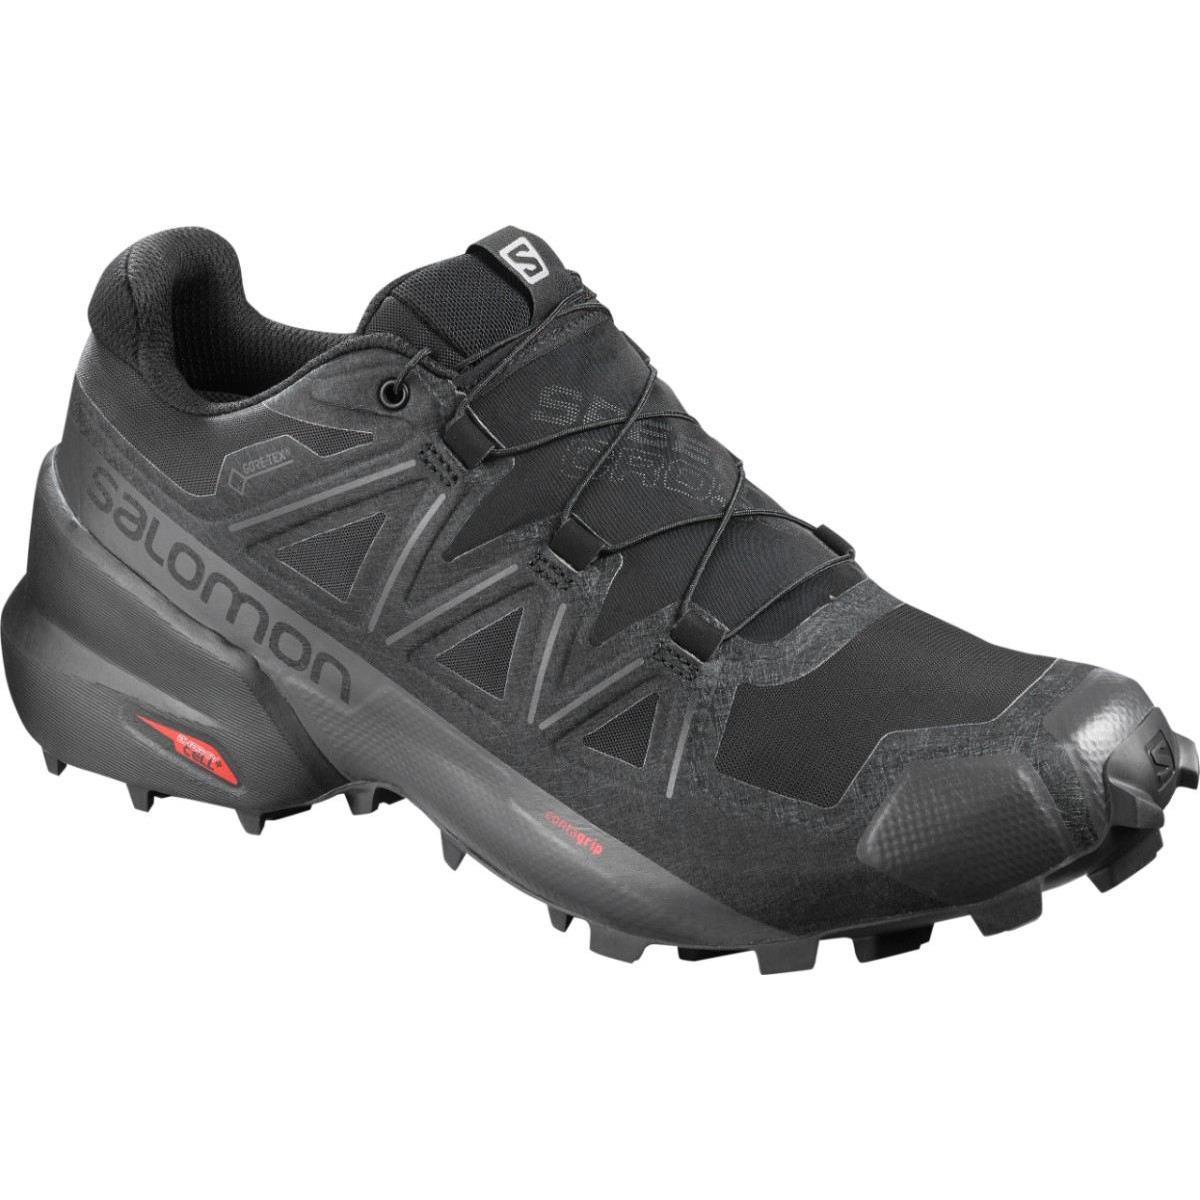 Salomon Pantofi alergare Salomon SPEEDCROSS 5 GTX - Negru